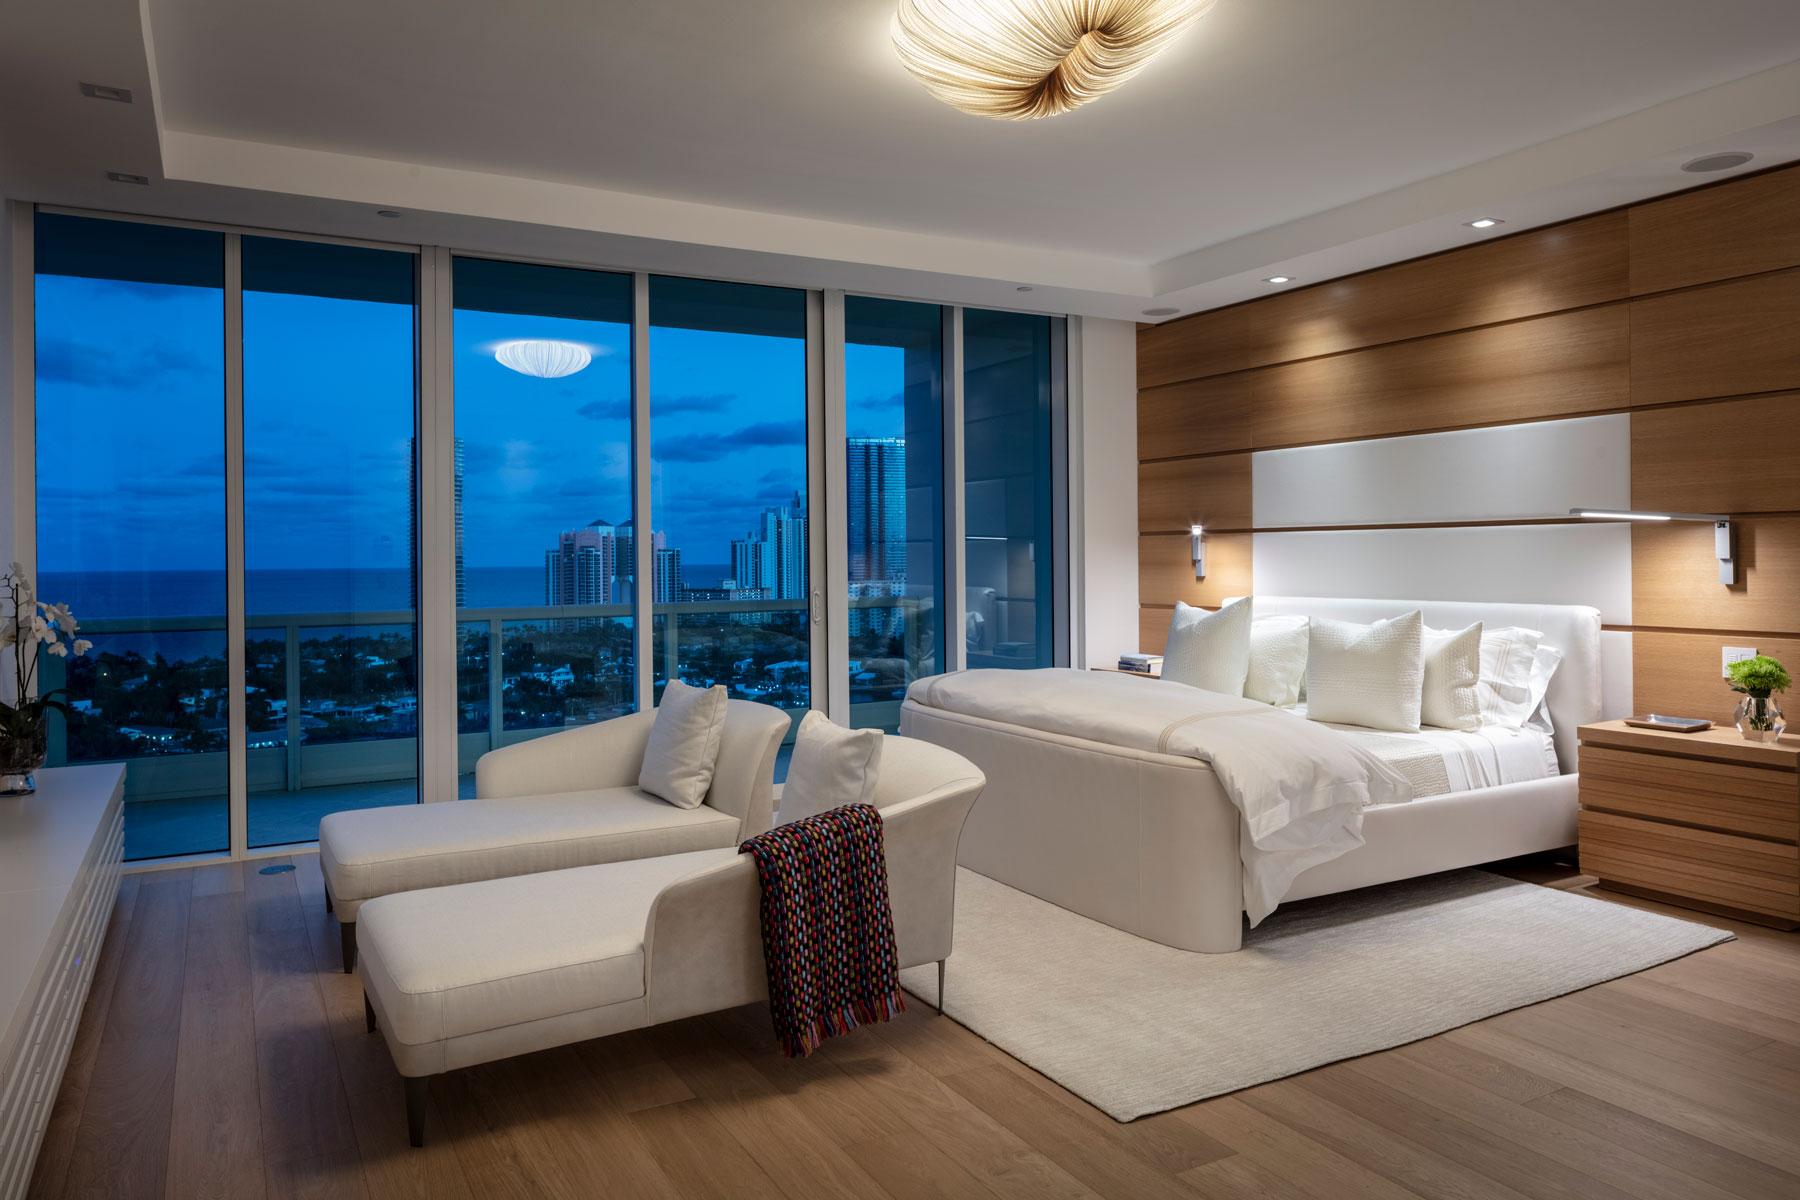 Amazing bedroom designed by Tamara Feldman